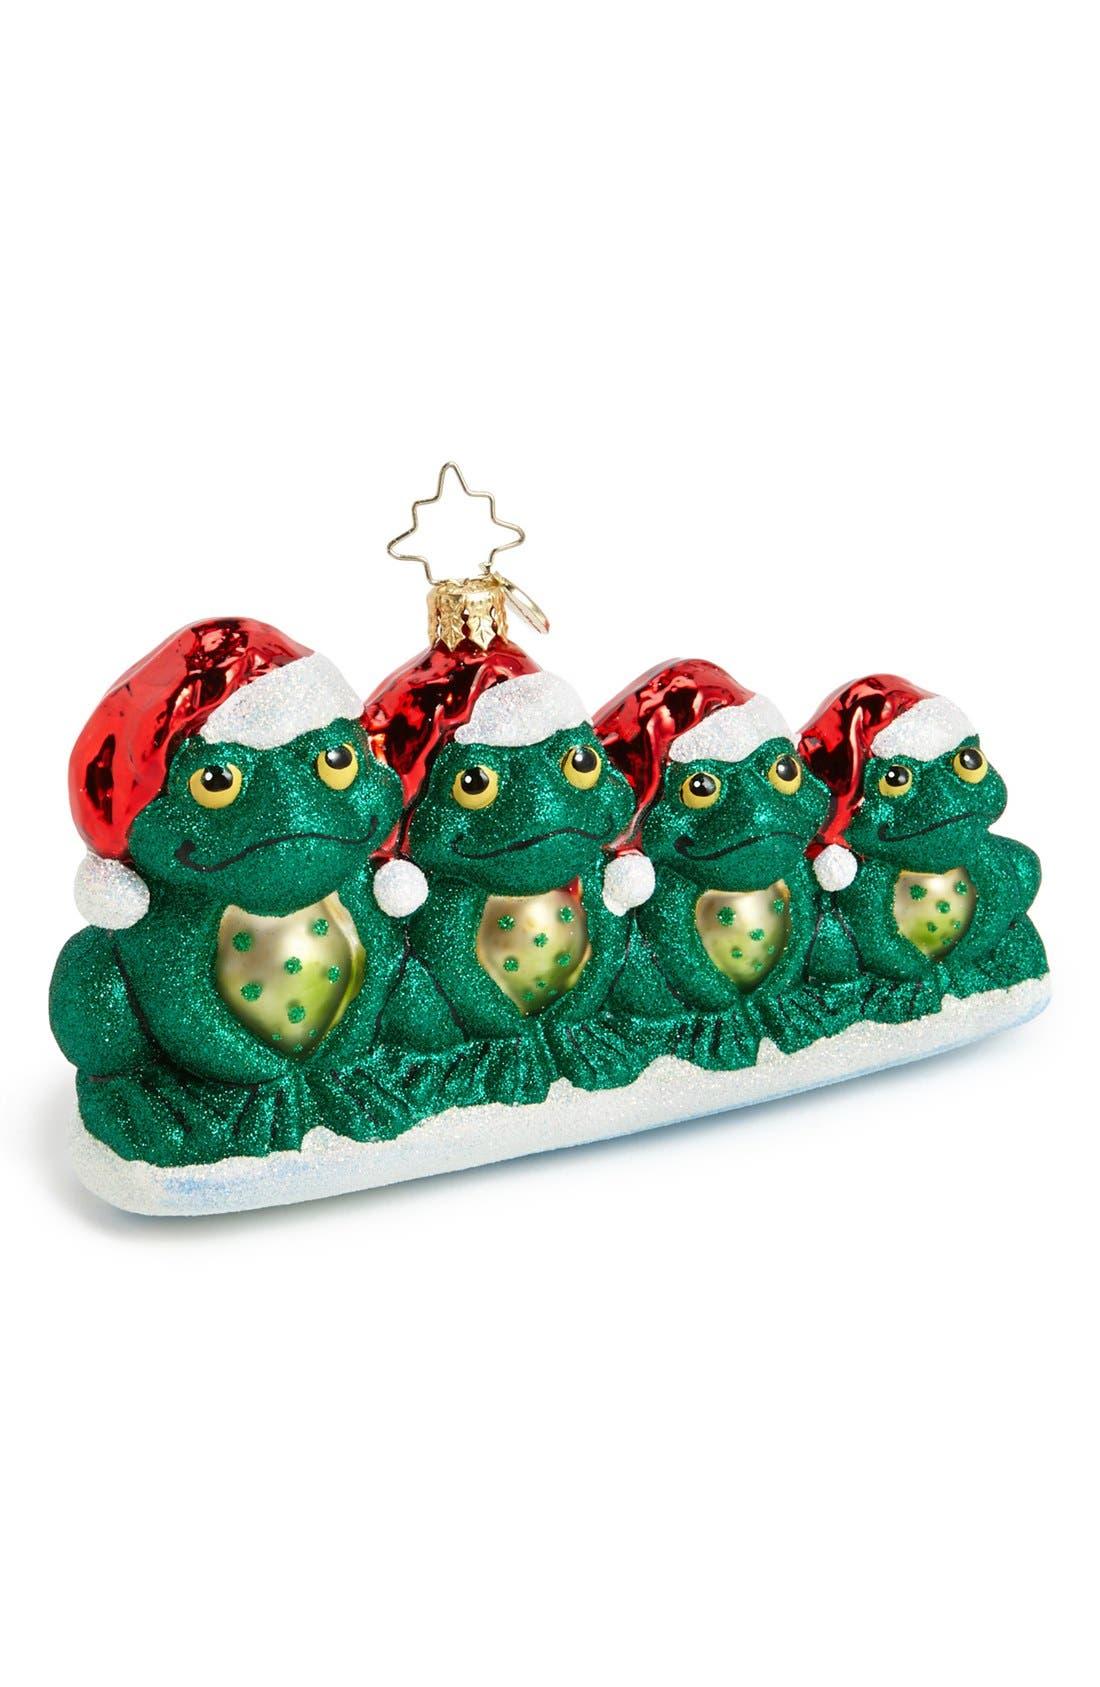 Main Image - Christopher Radko 'Wish You a Froggy Christmas' Ornament